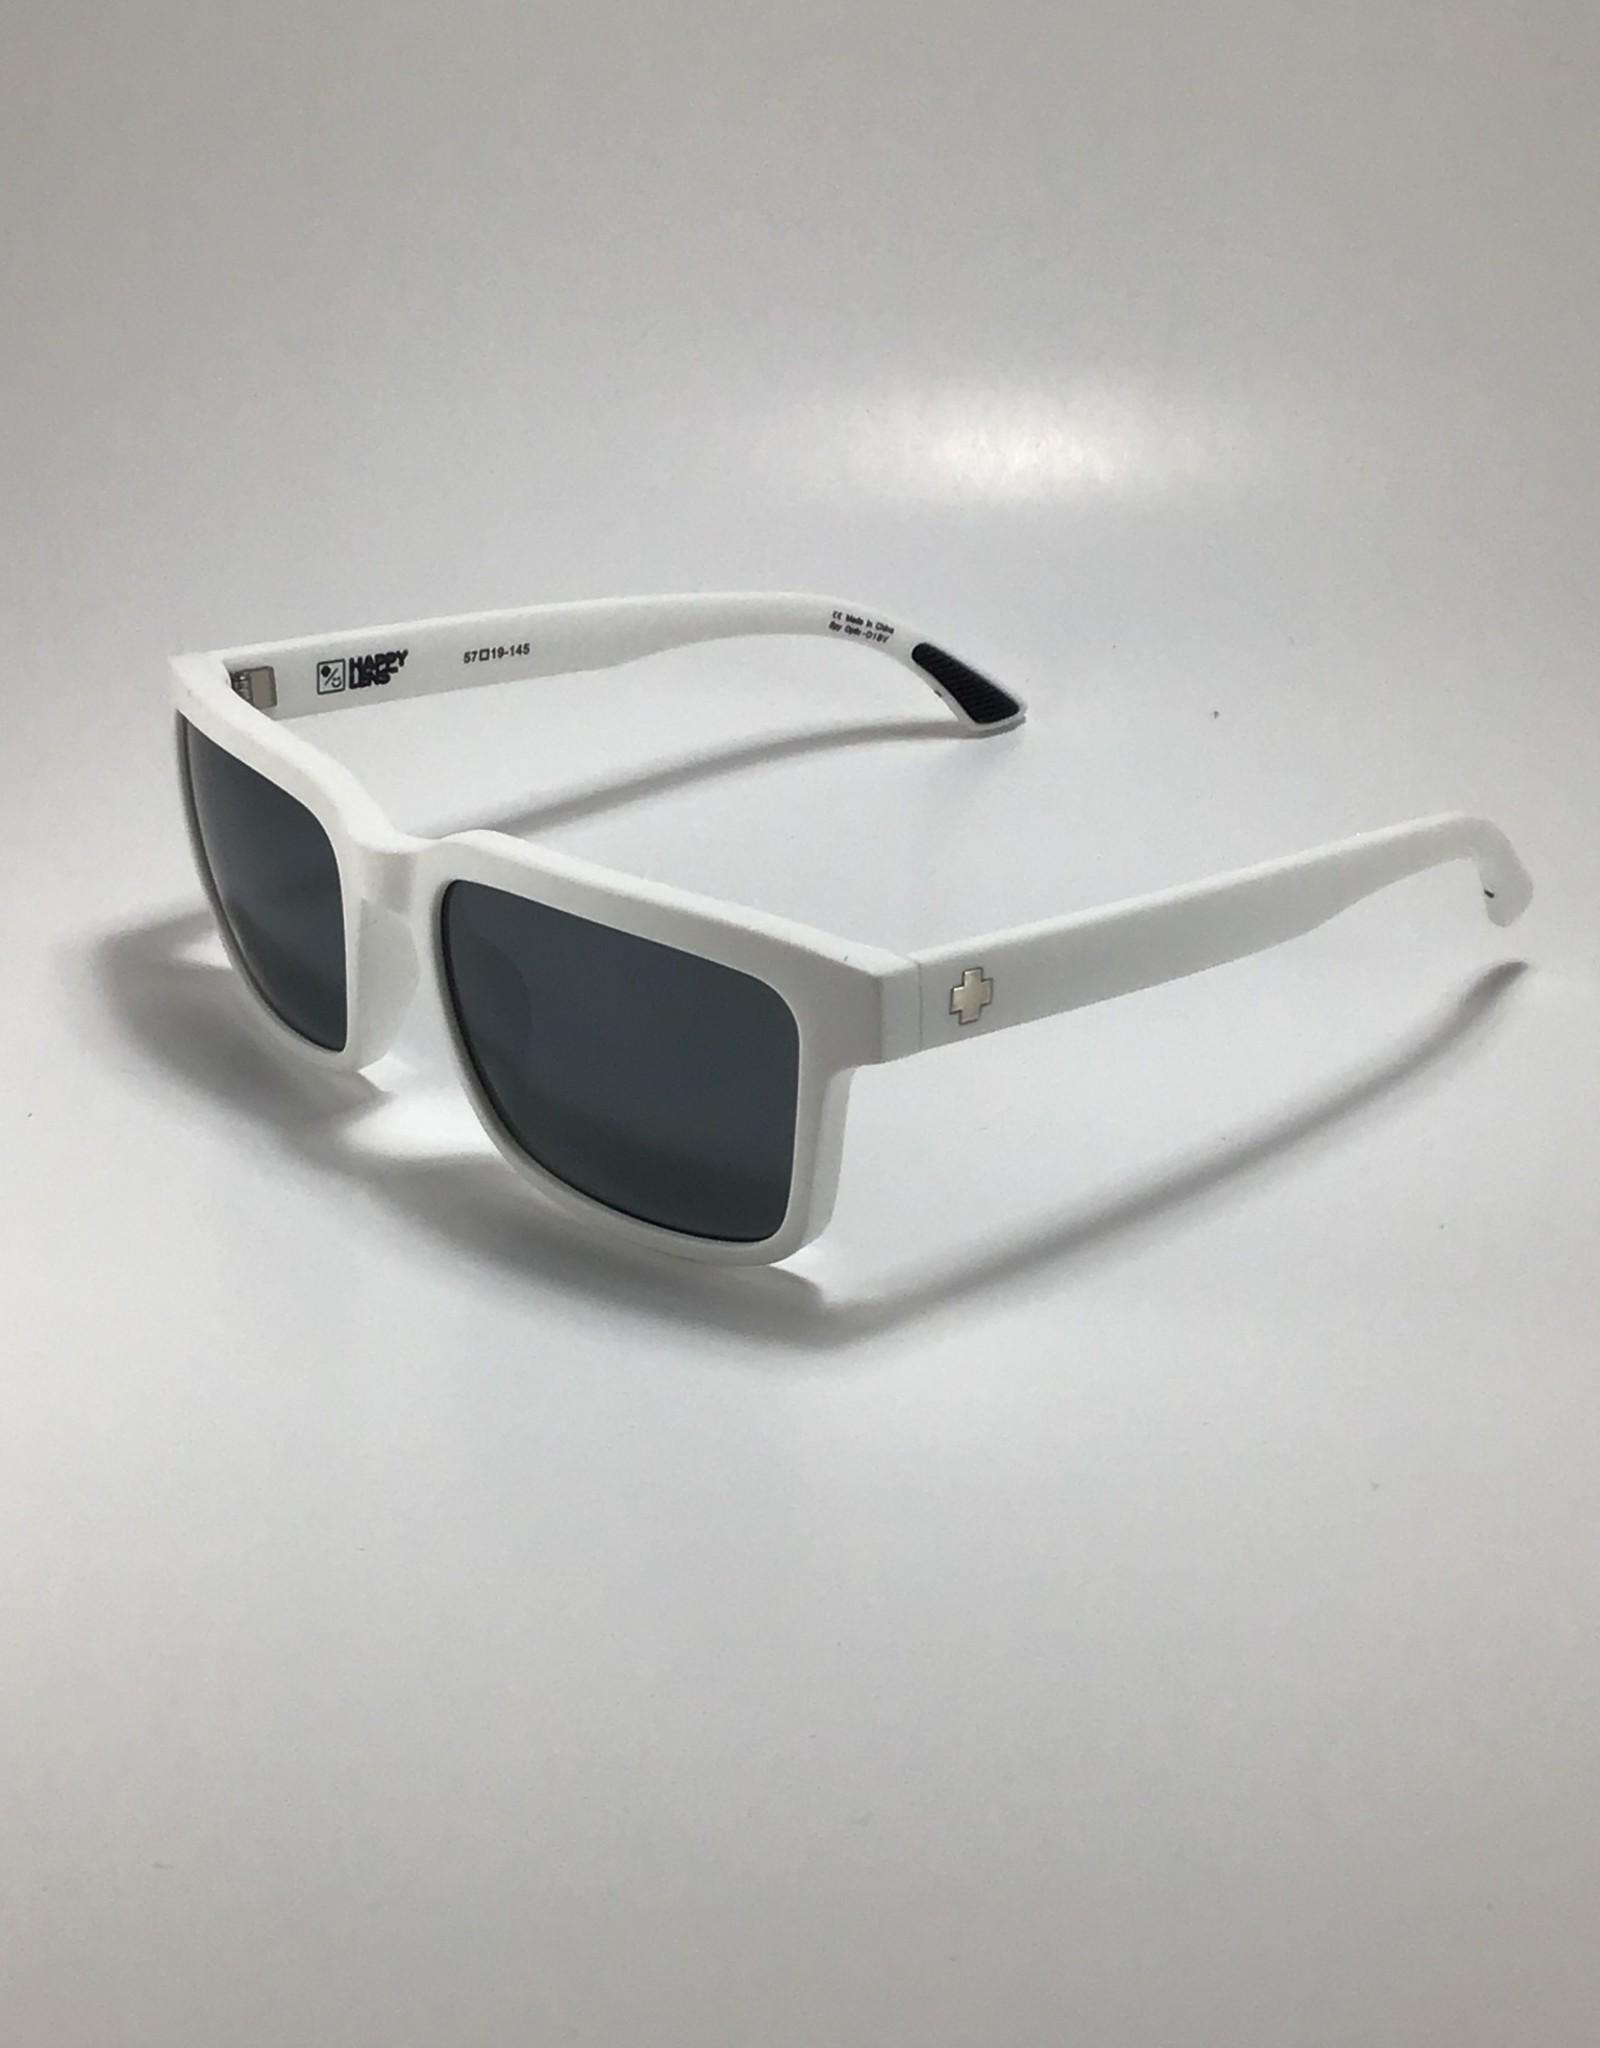 Spy Helm 2 Matte White - Happy Gray Green w Silver Spectra